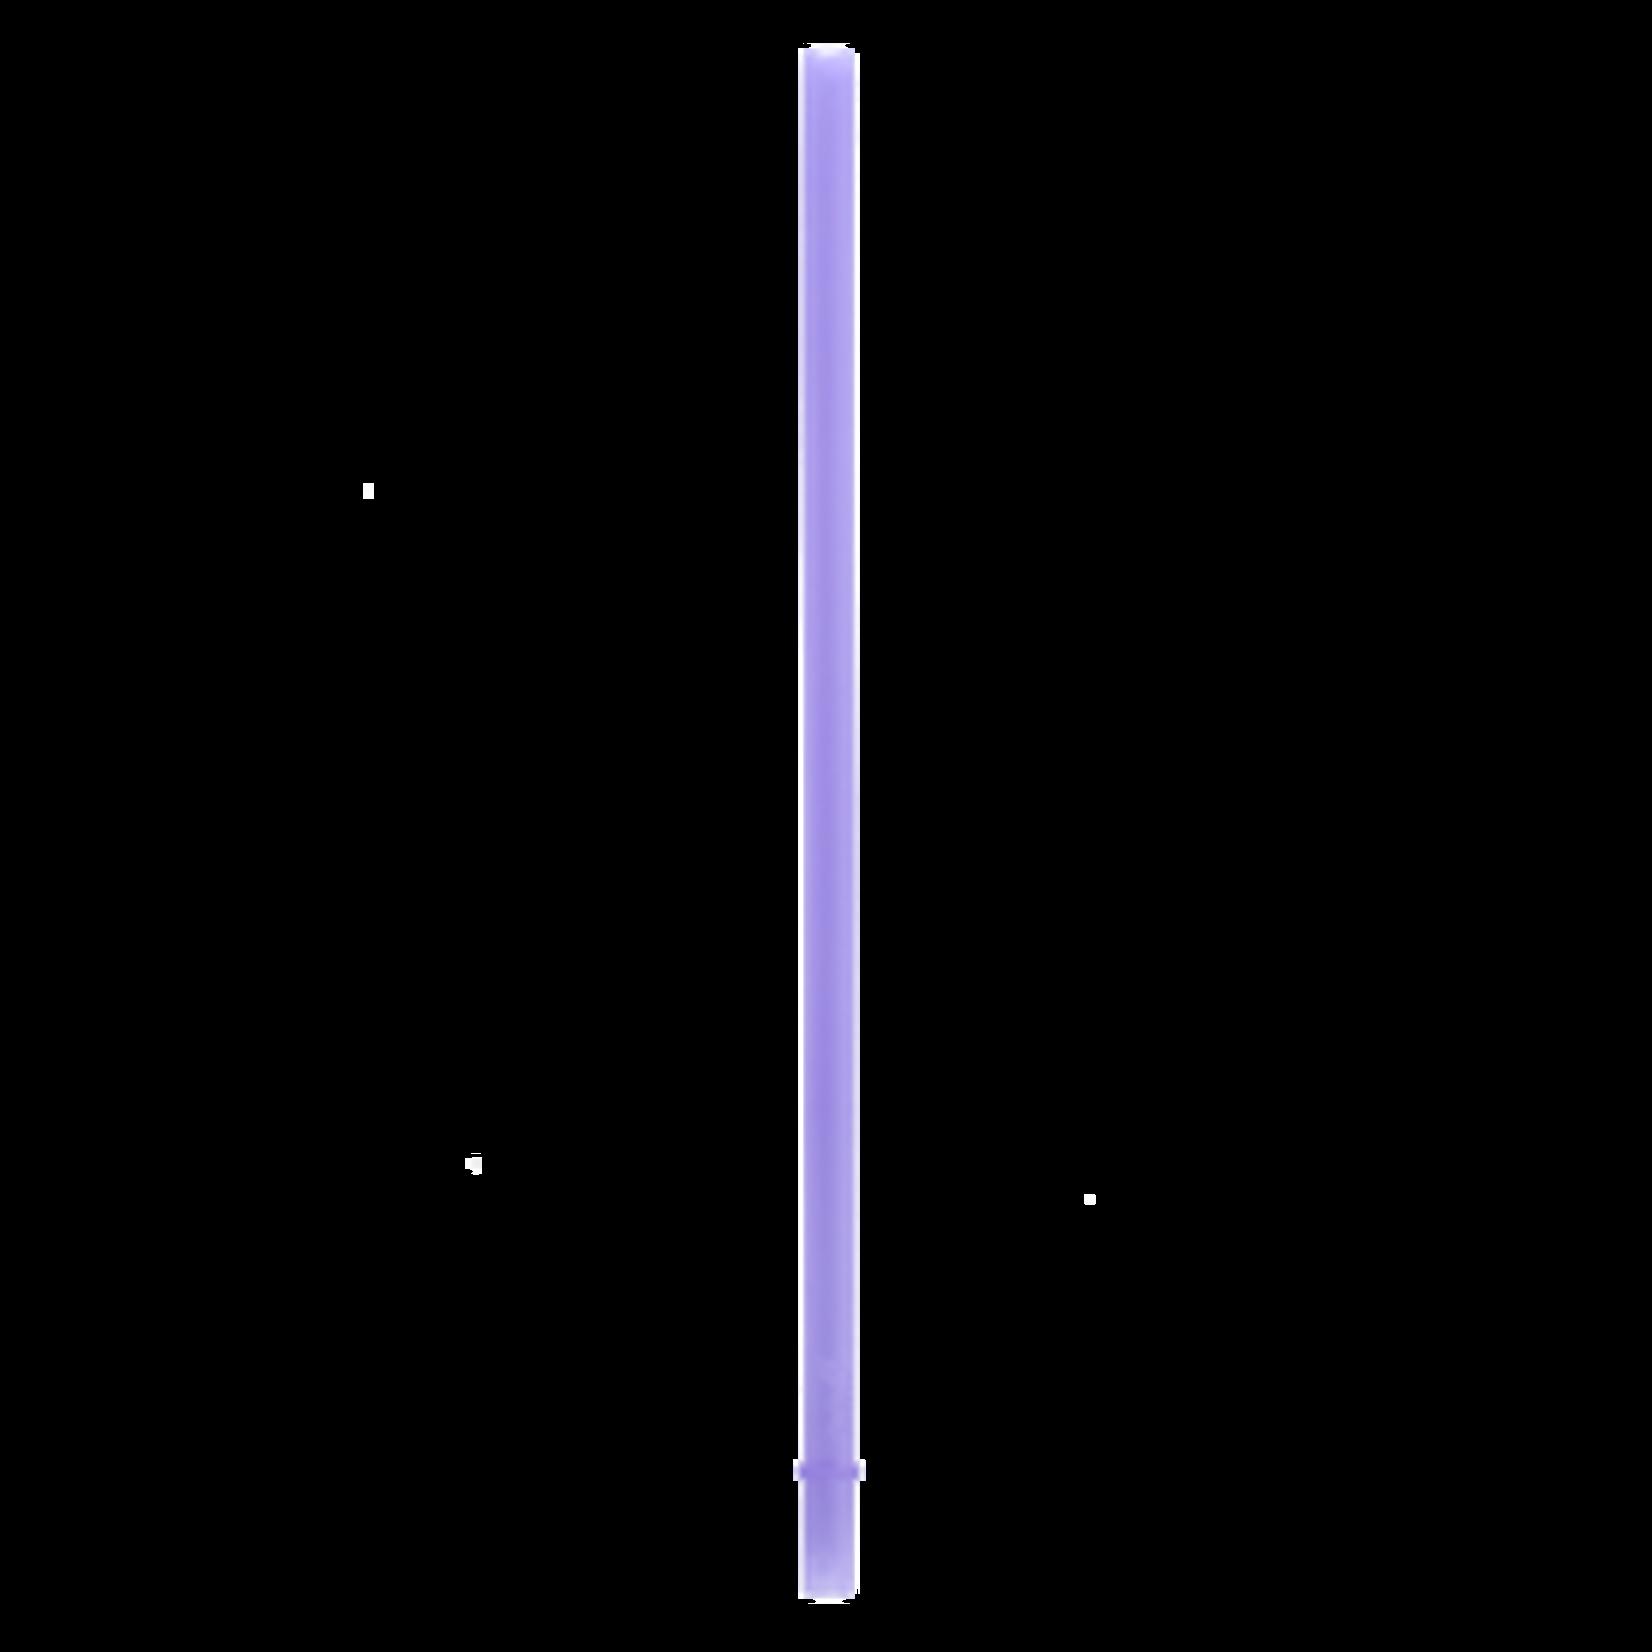 SILICONE STRAWS 2 PACK - PURPLE